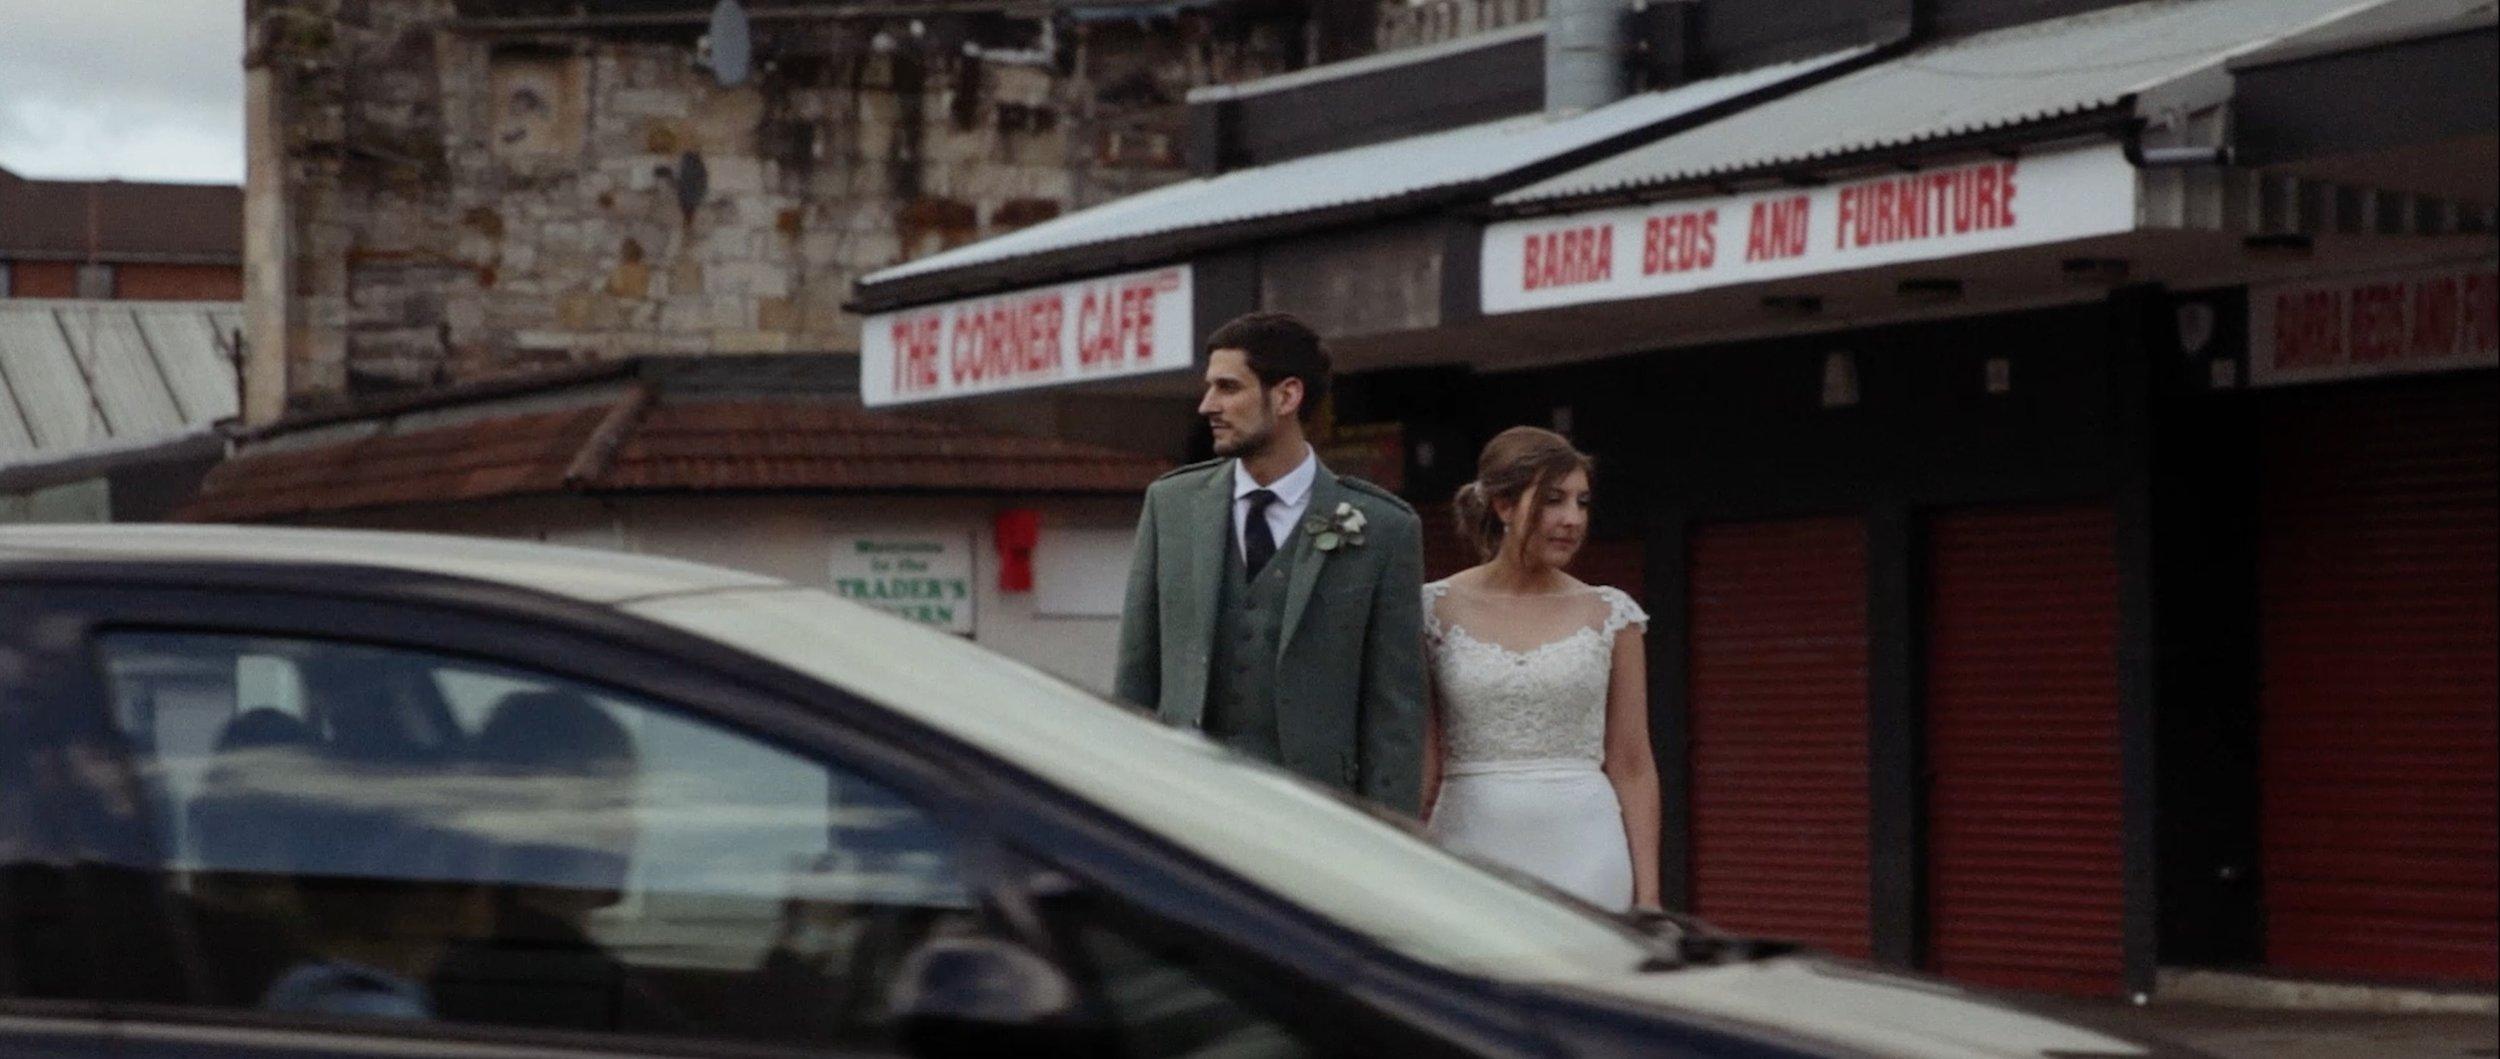 inverness-wedding-videographer_LL_05.jpg